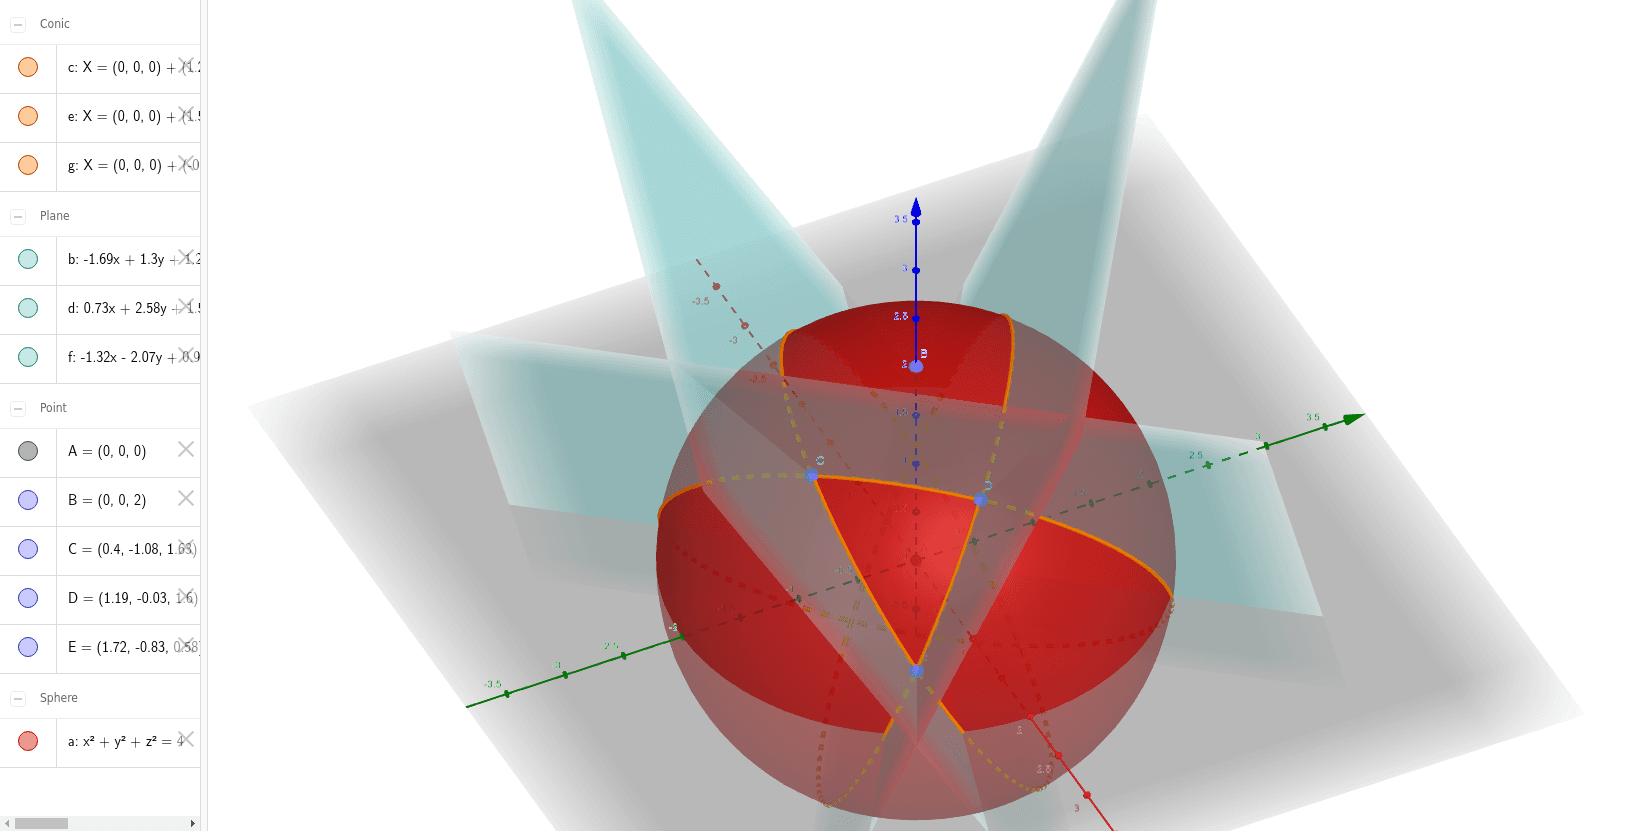 Triângulo esférico CDE